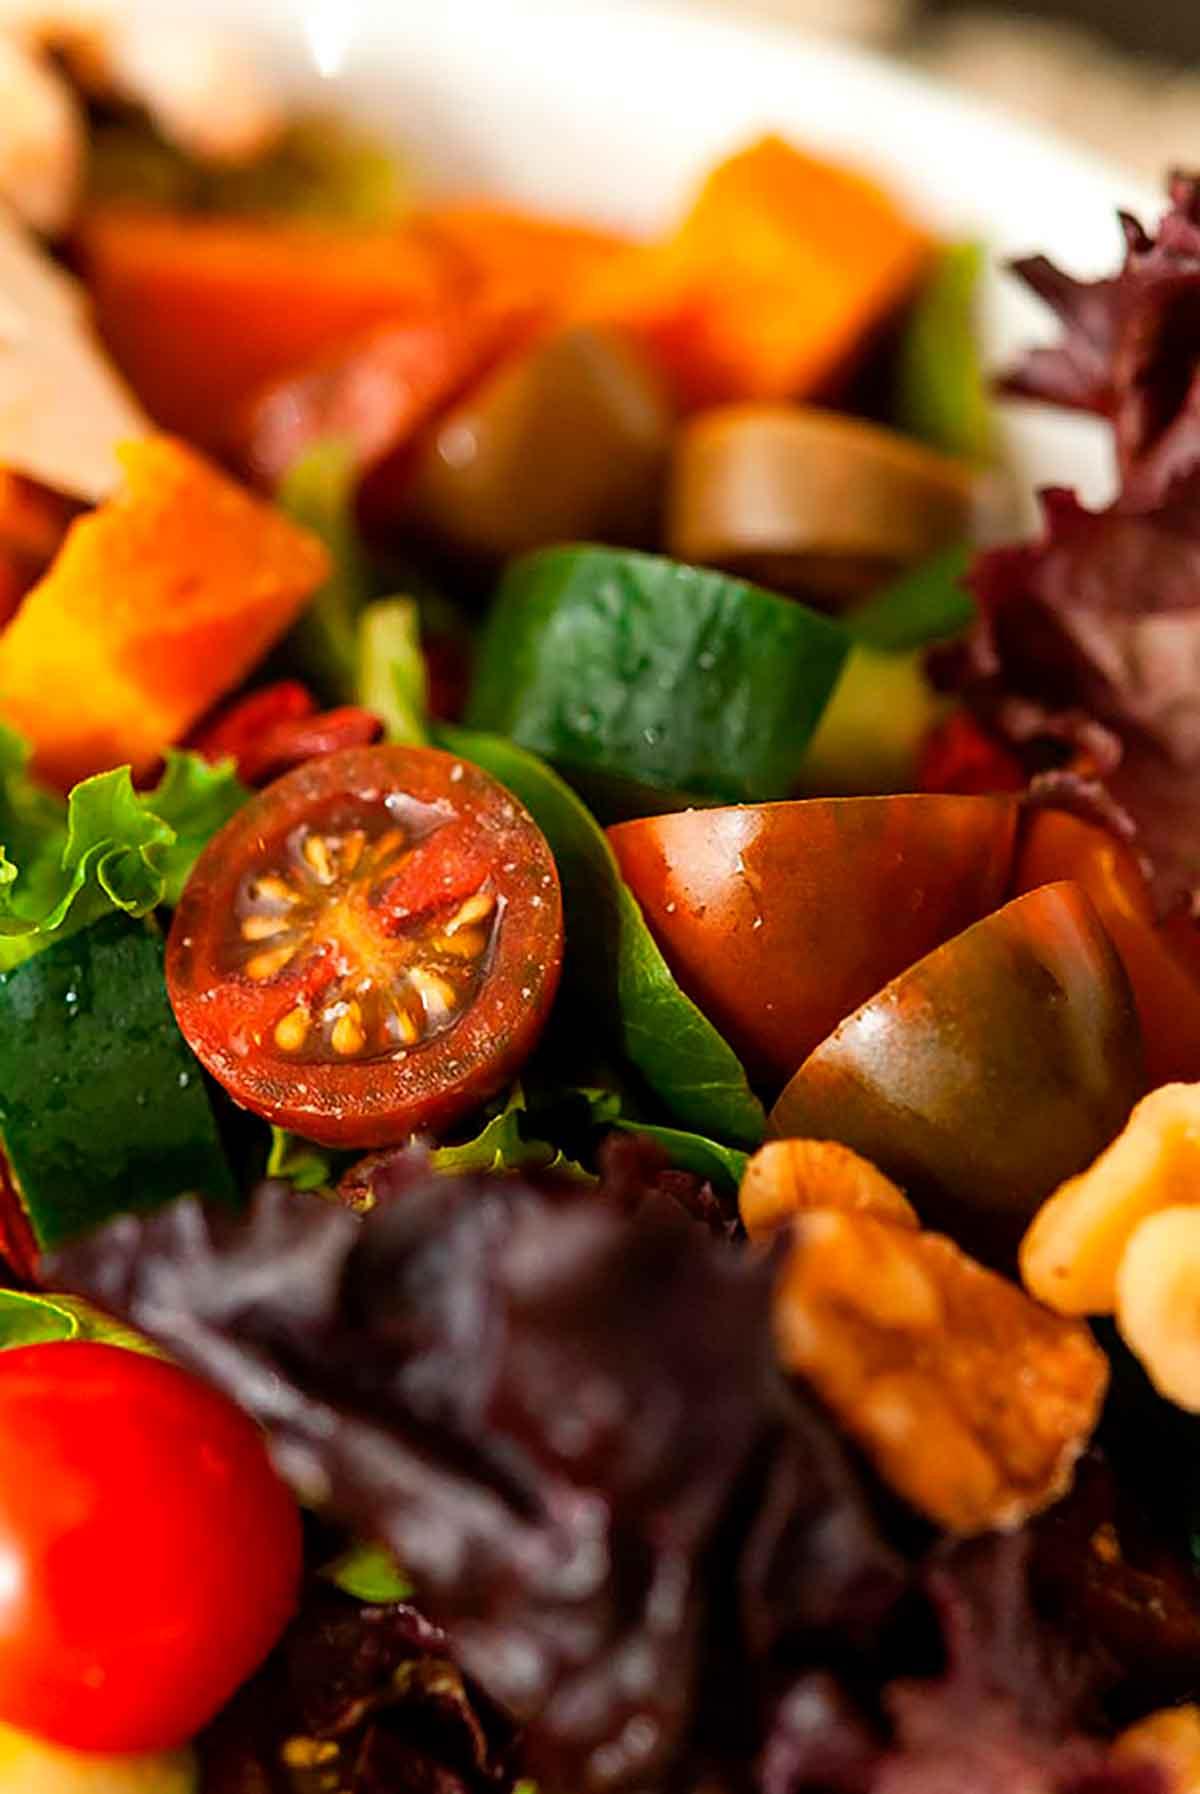 A close shot of a colorful salad.